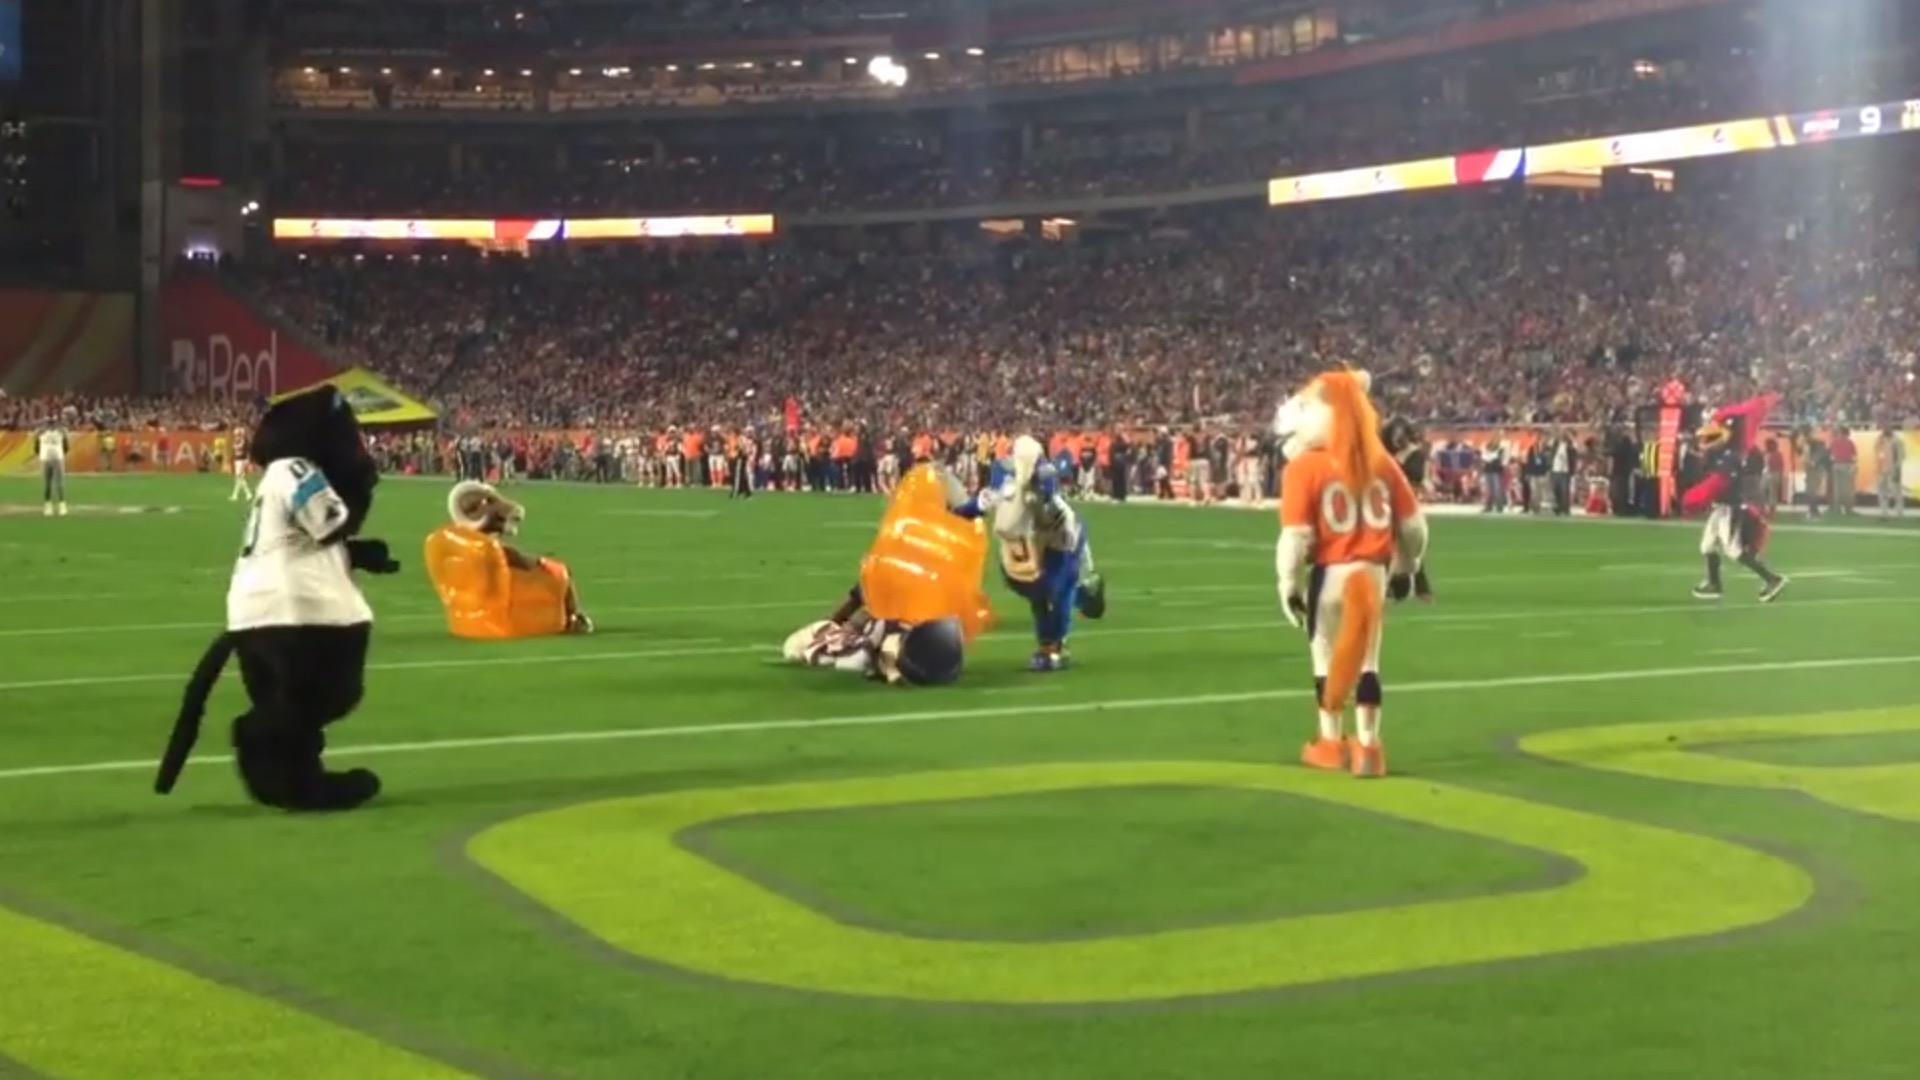 Colts Mascot Blue Beats Up Patriots Mascot With Inflatable